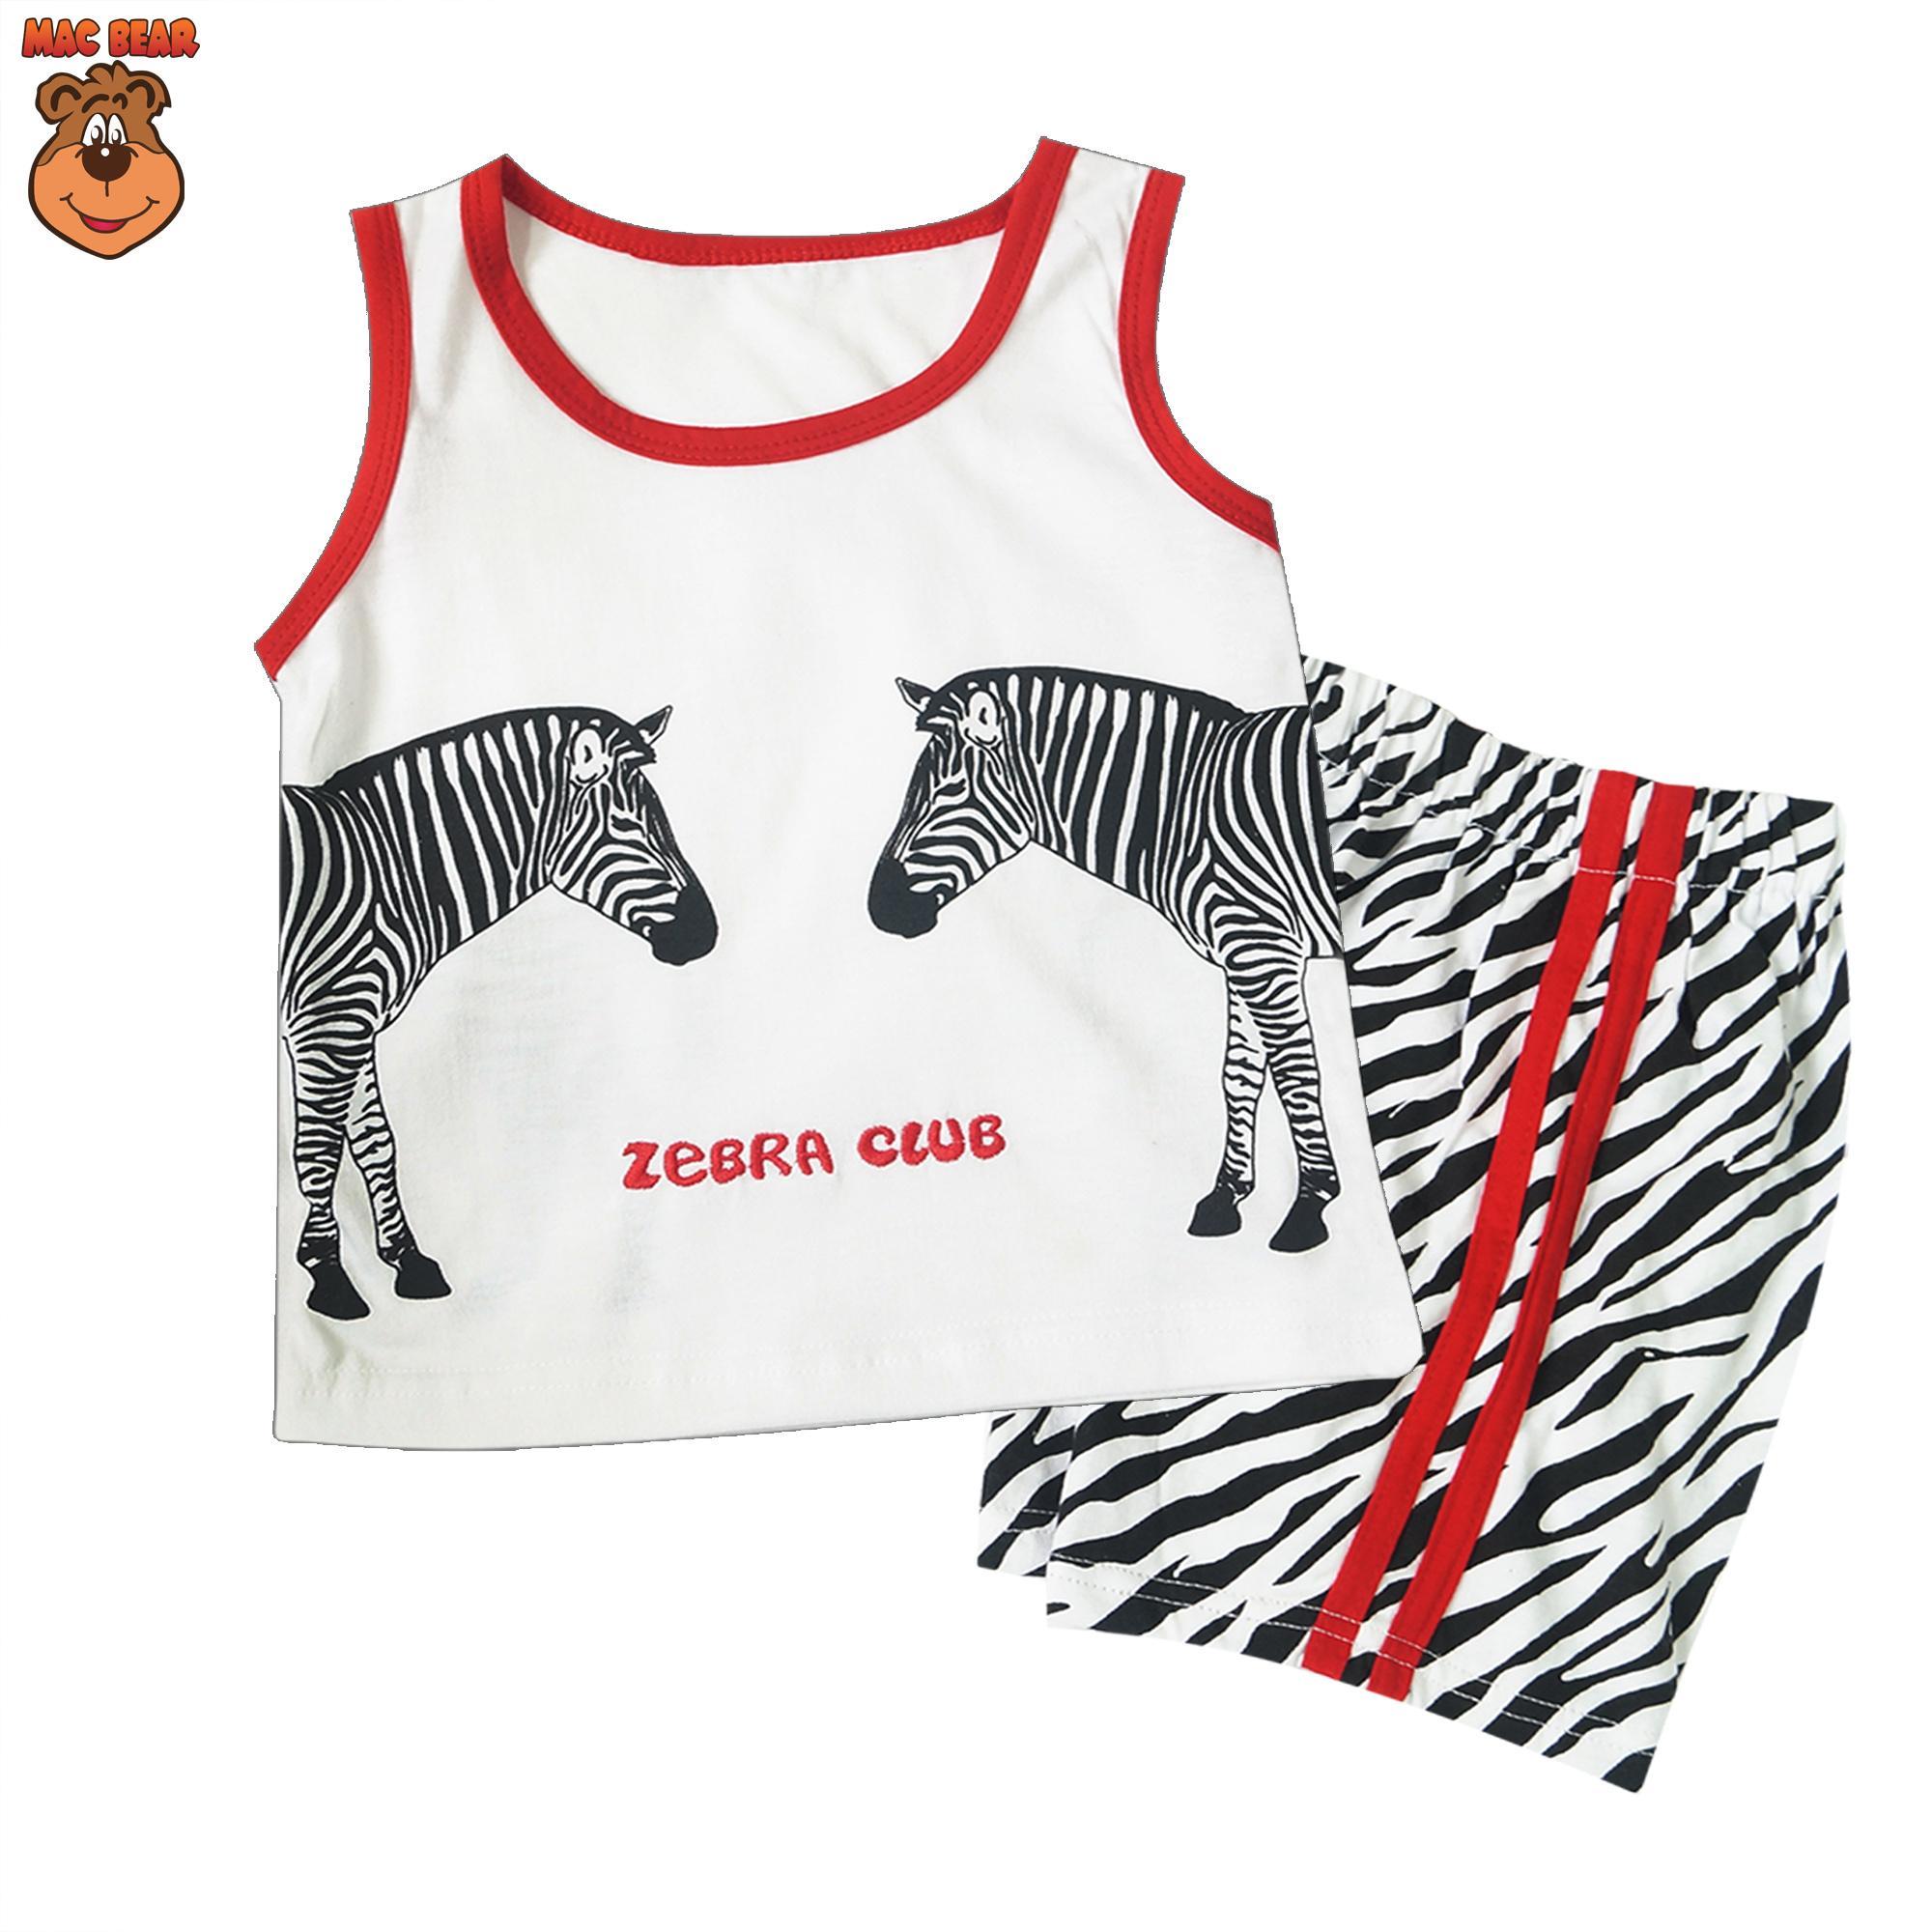 MacBear Kids Baju Anak Setelan Singlet Zebra Club